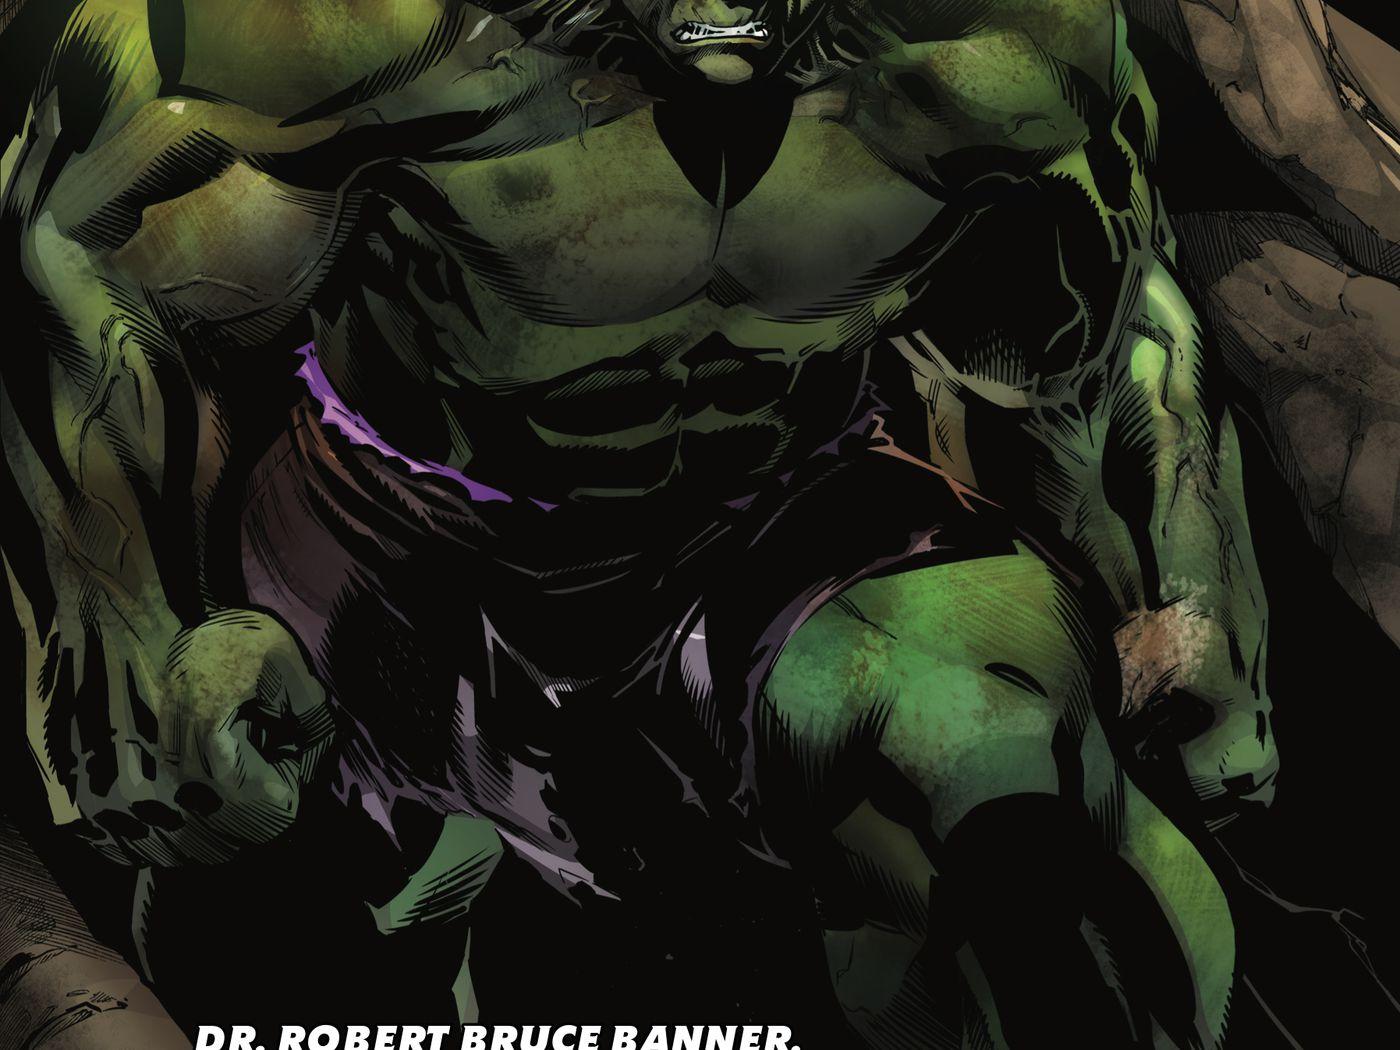 Immortal Hulk #1 brings the Hulk back to Marvel Comics - Polygon